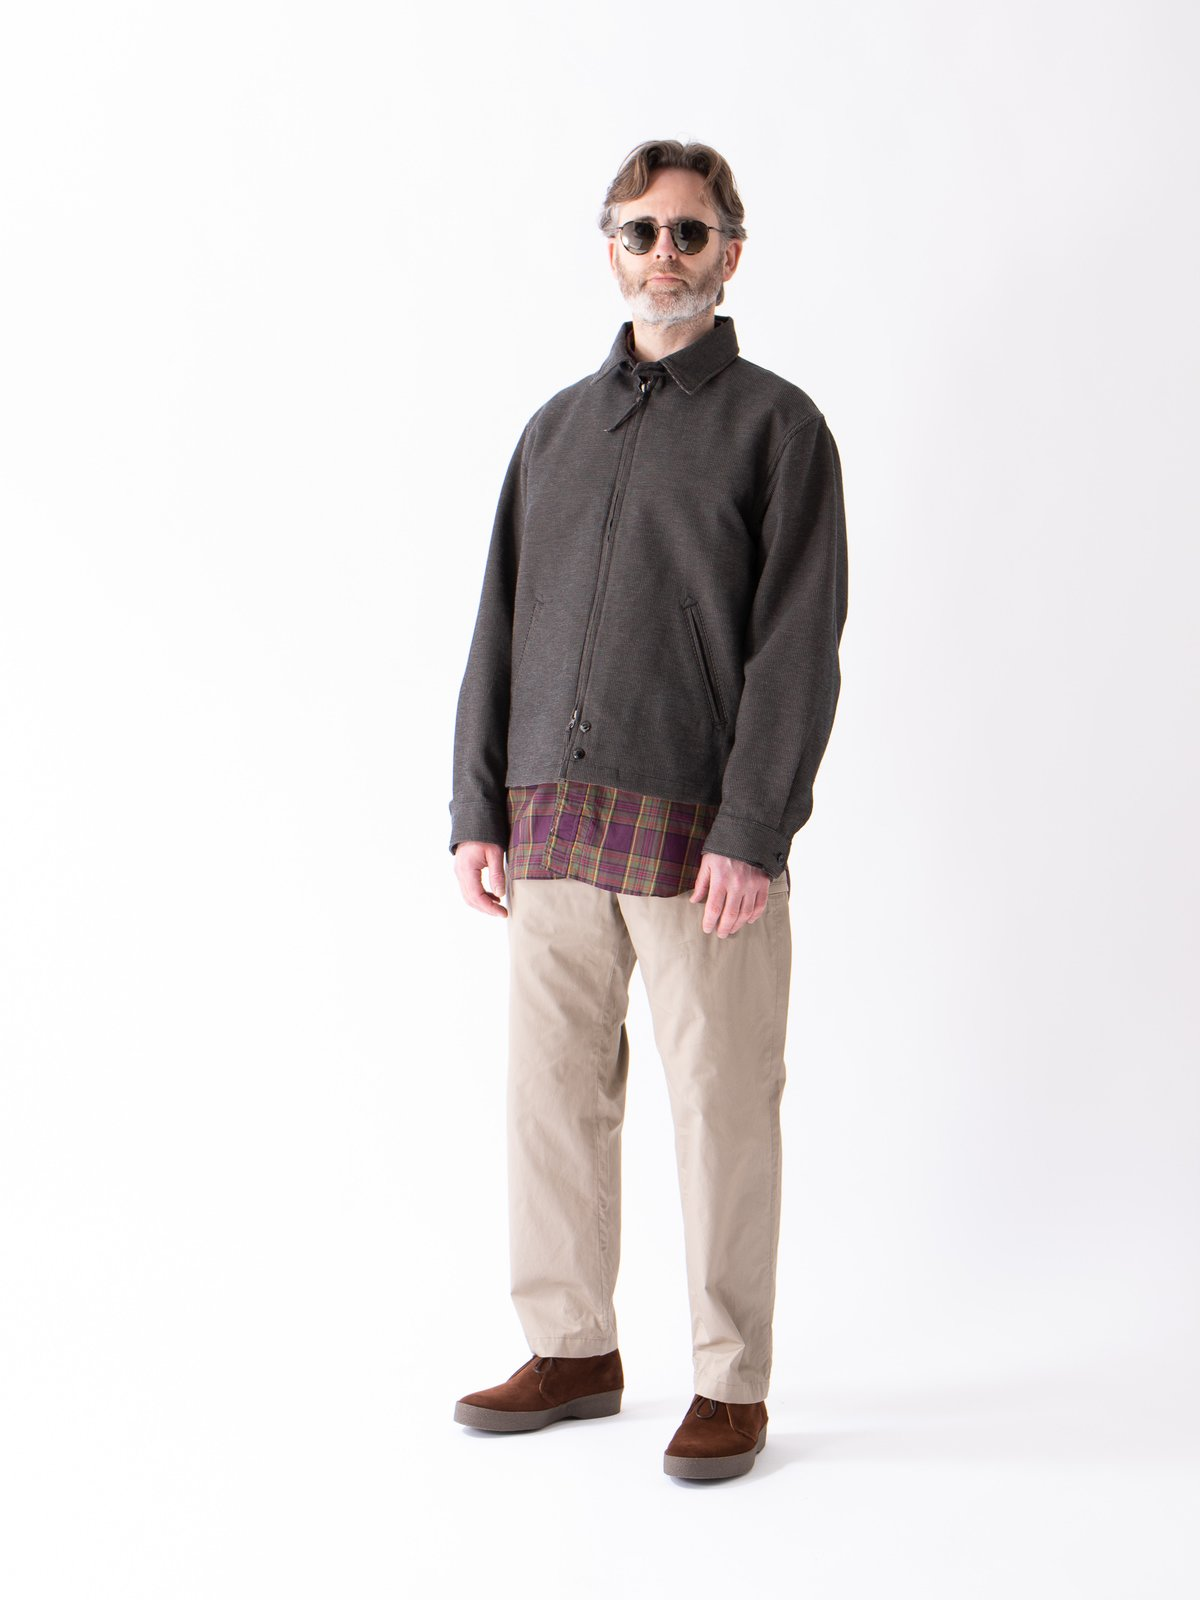 Khaki Highcount Twill Drawstring Pant - Image 3